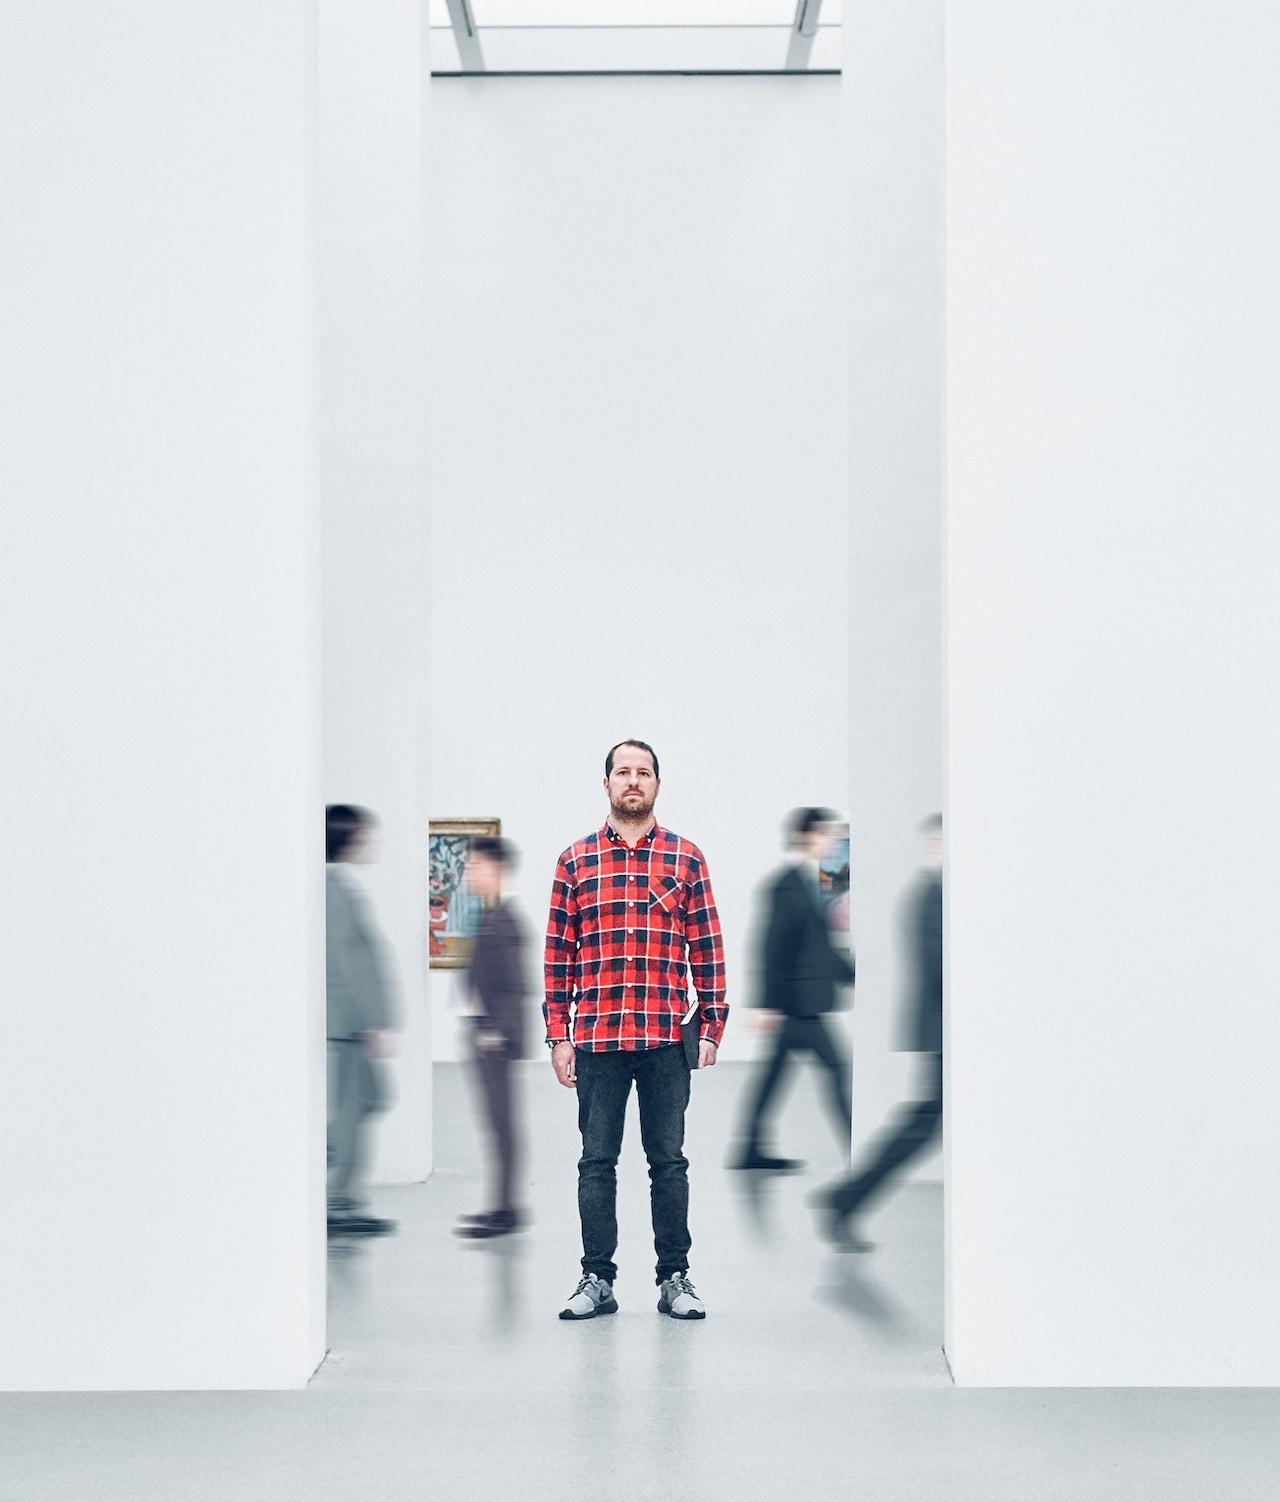 Jason Battersby stoji v galeriji